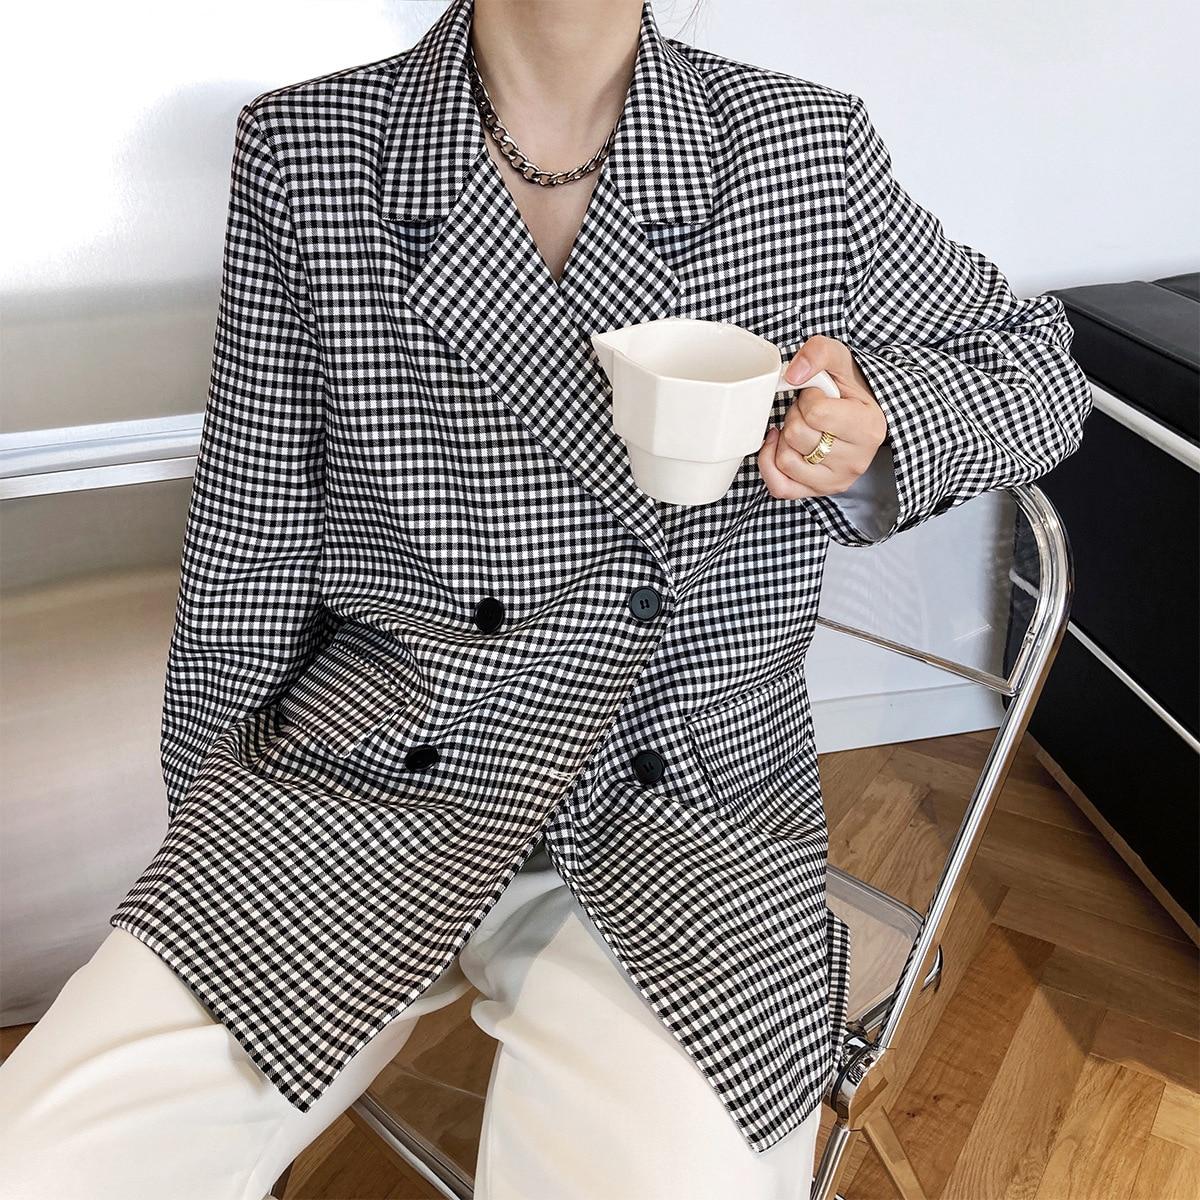 Korean Black White Plaid Suit Coat Women's Spring Autumn New Long Sleeve Double Breasted Loose Blaze